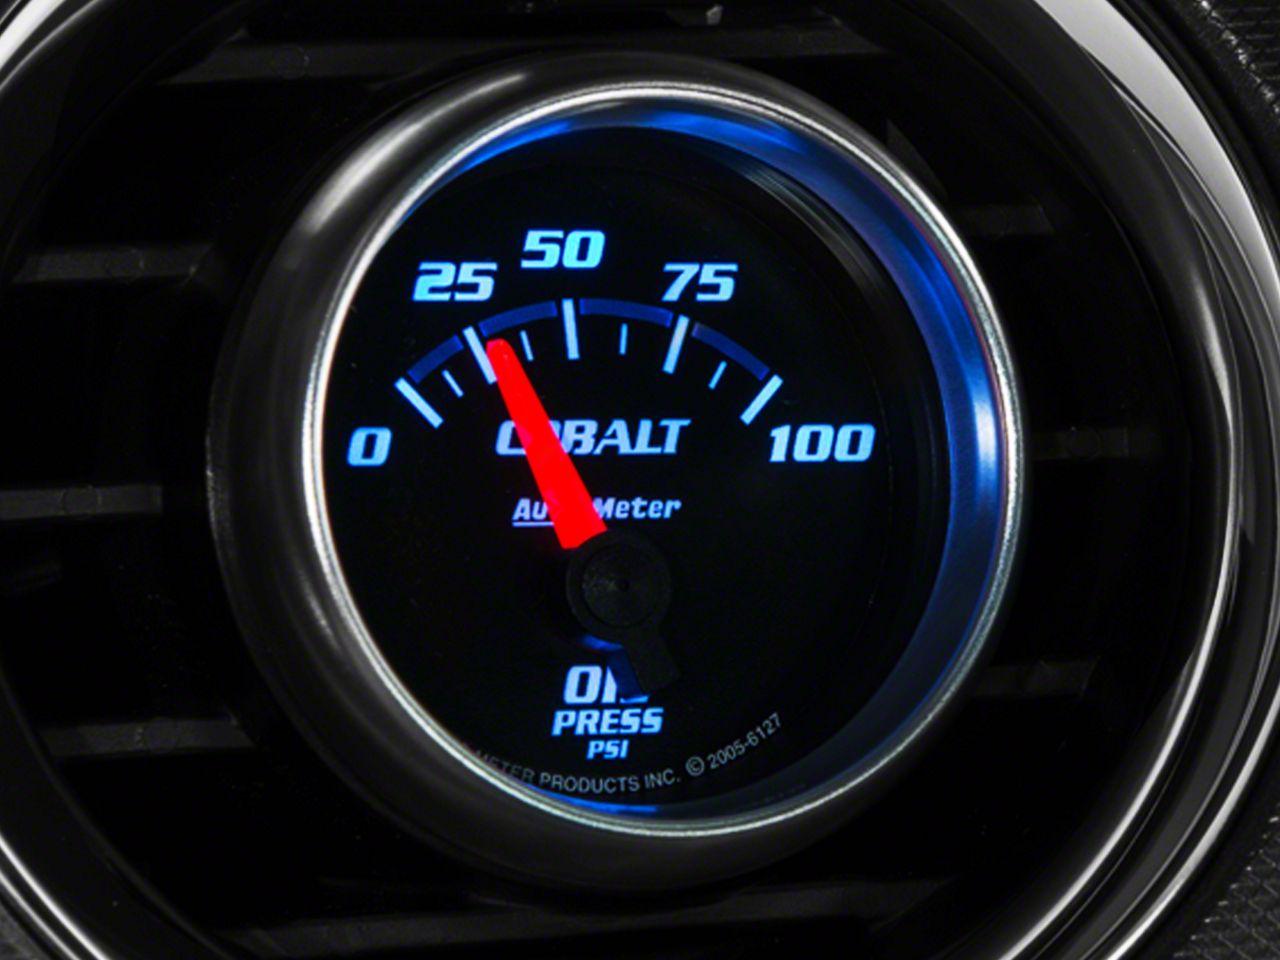 Auto Meter Cobalt Oil Pressure Gauge - Electrical (08-18 All)